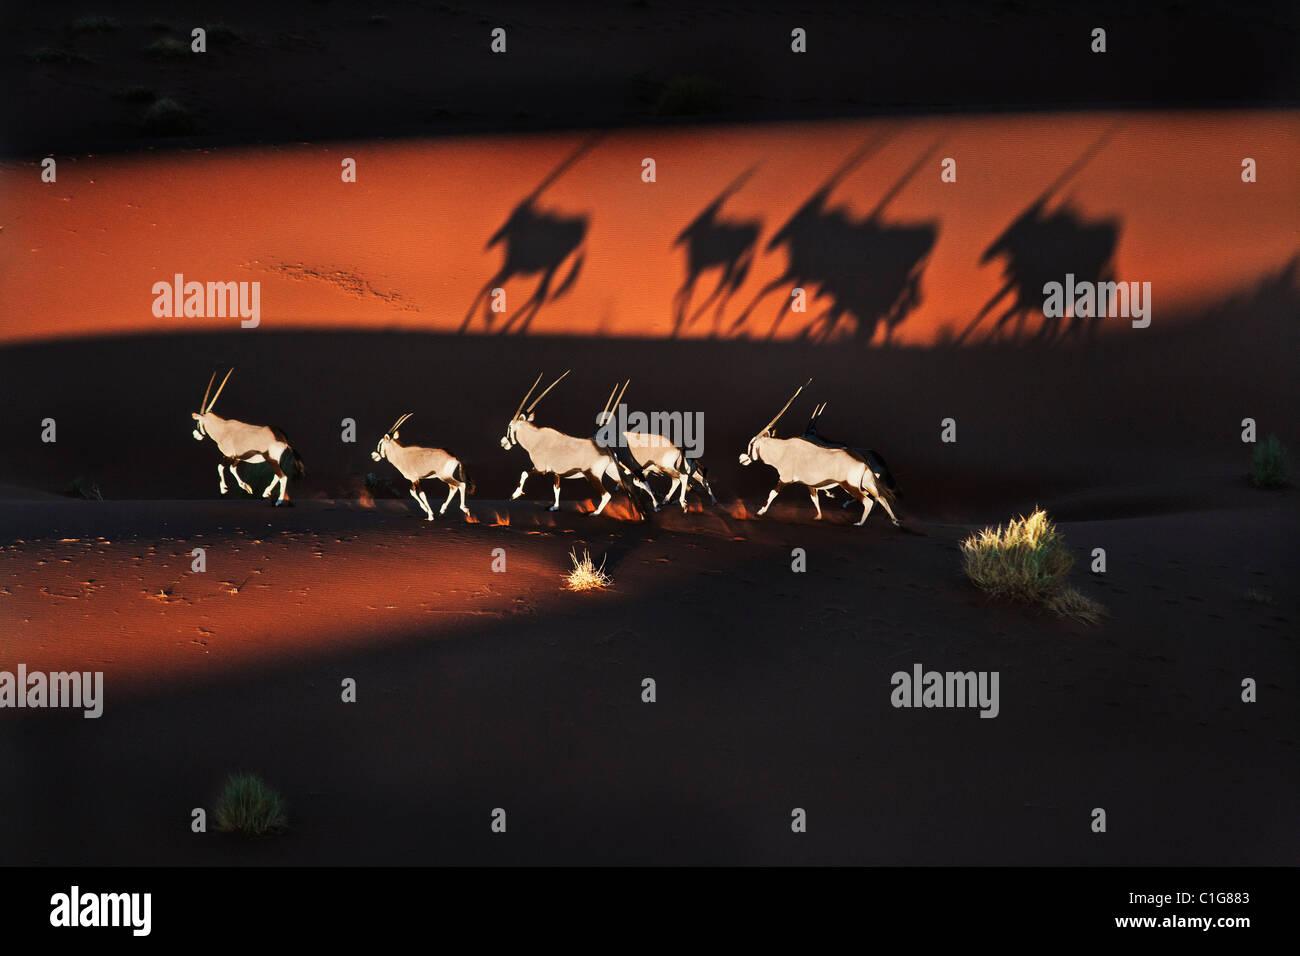 Gemsbok (Oryx gazella) nel deserto tipico habitat. Dist. sud-ovest e nord Africa Orientale. Naukluft National Park, Immagini Stock